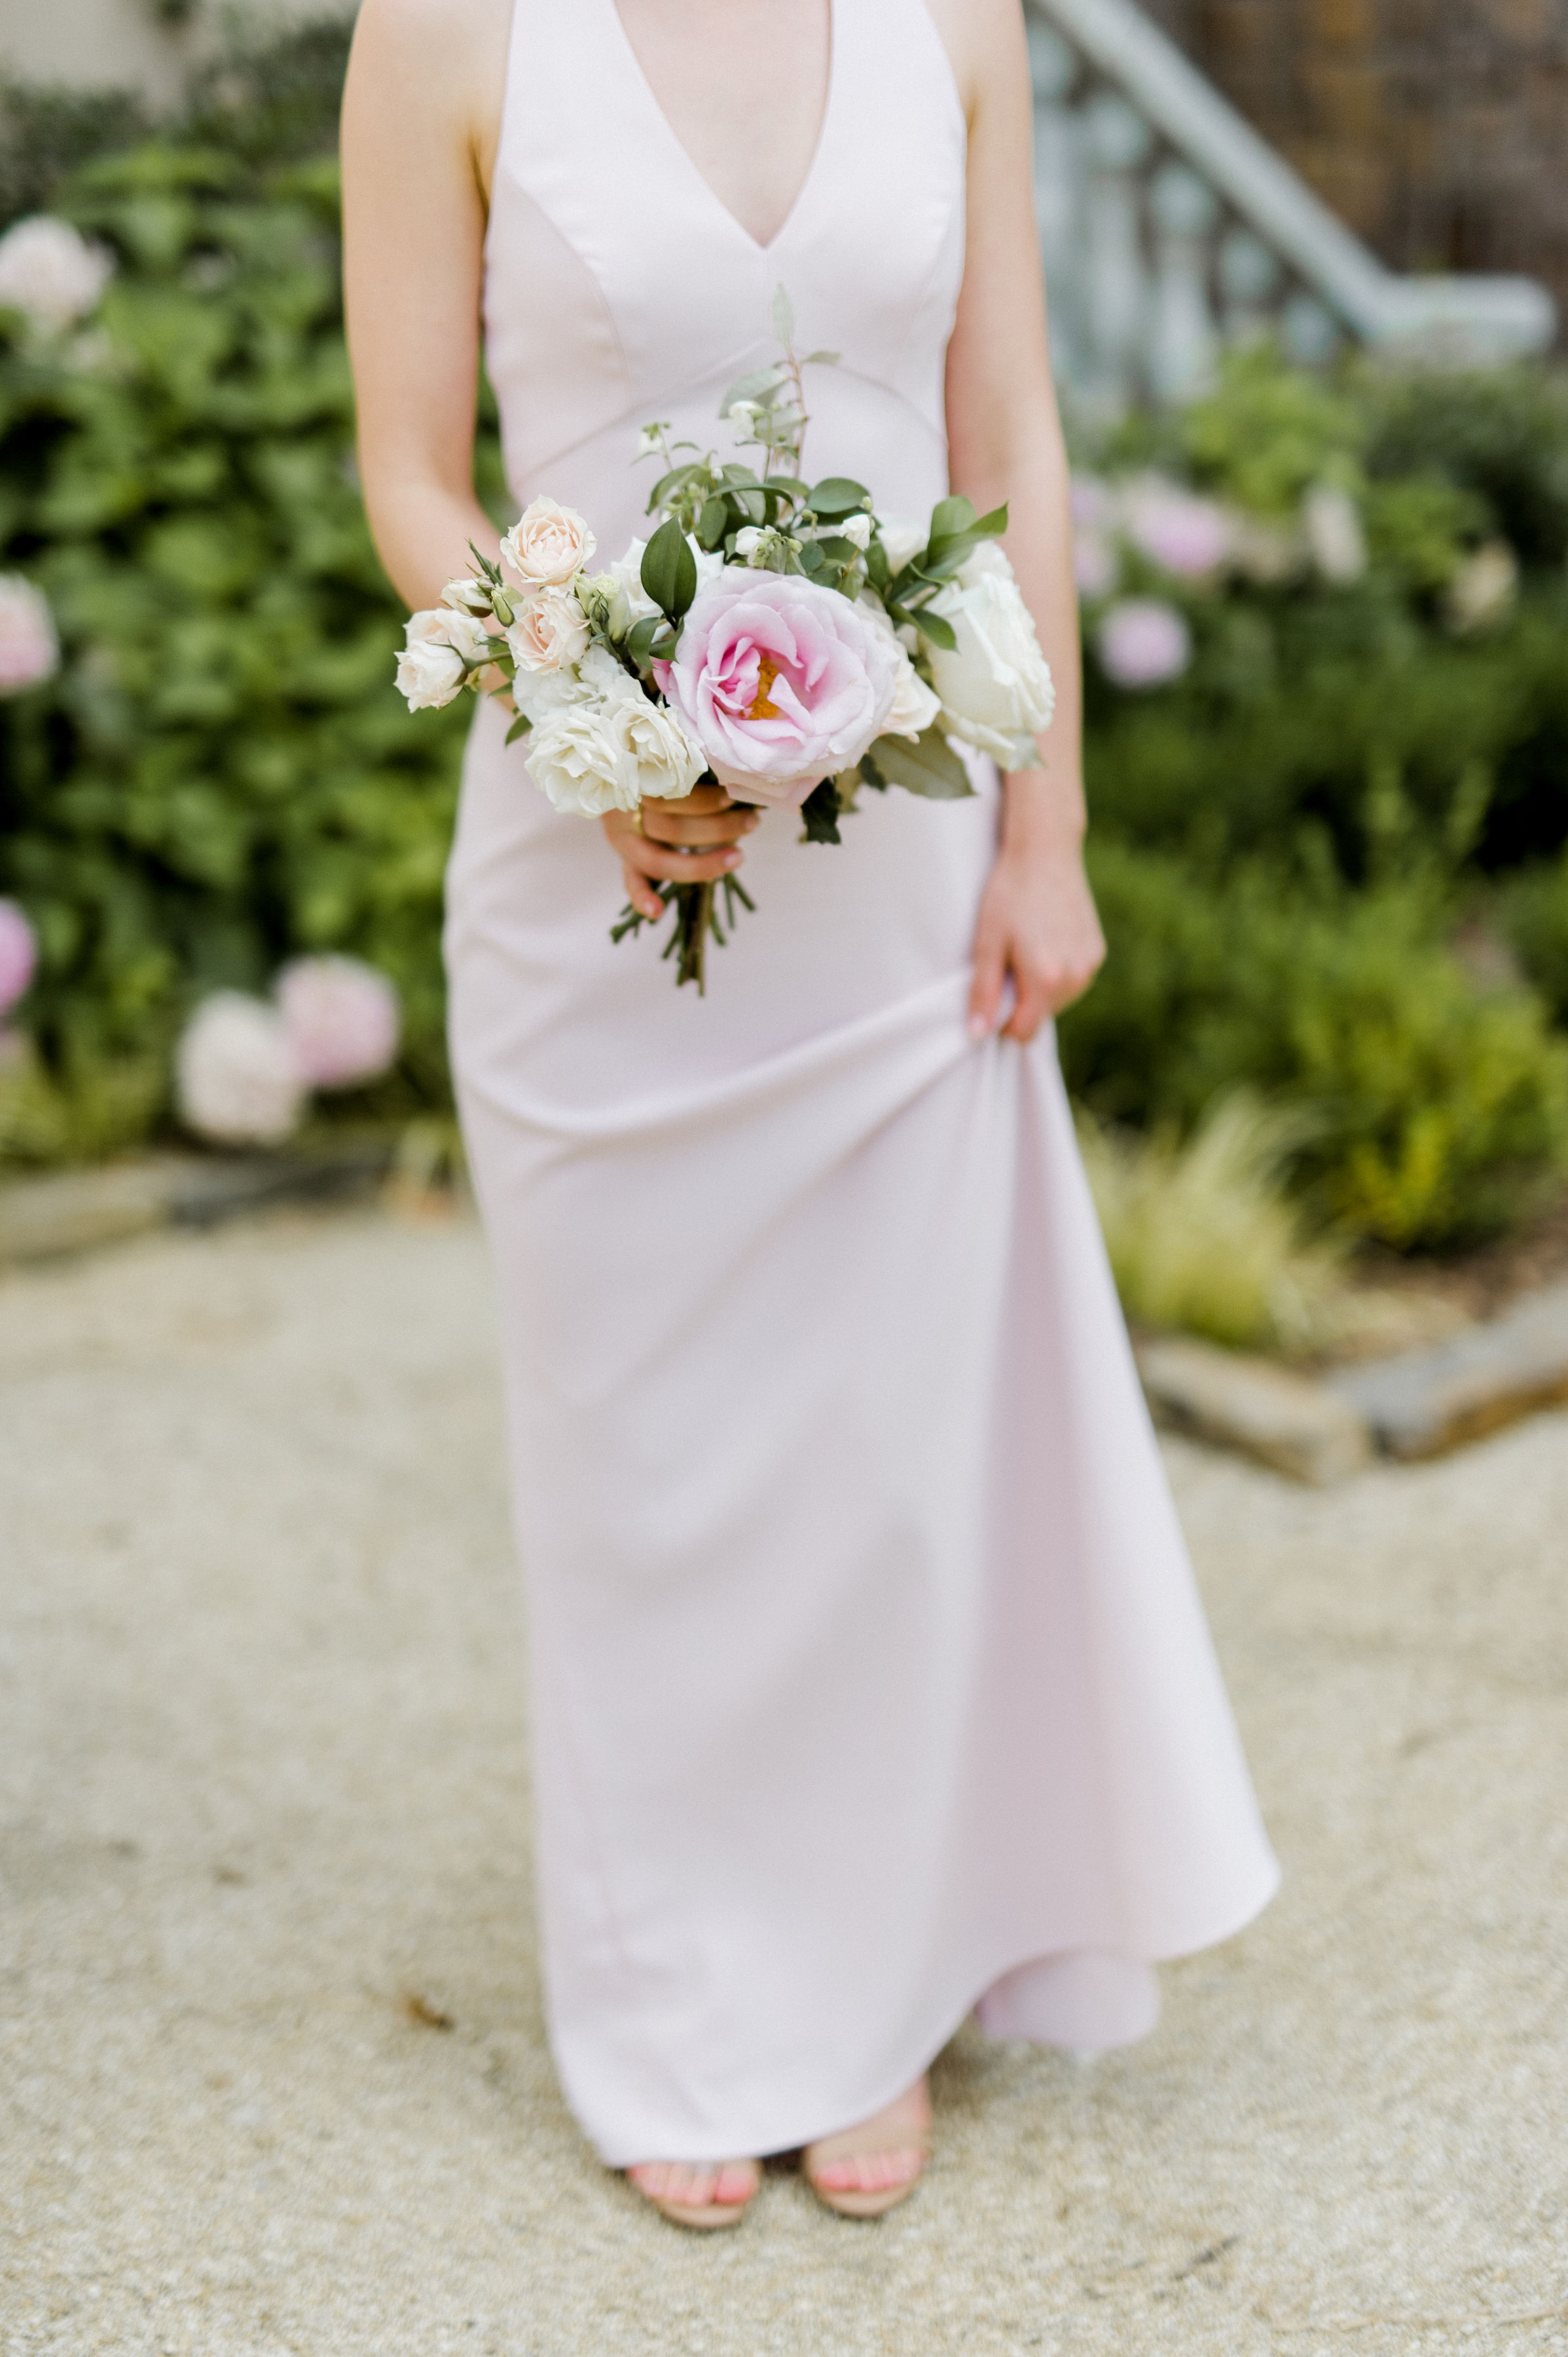 McElravey_Wedding_CarolineLimaPhotography_2018_157.jpg